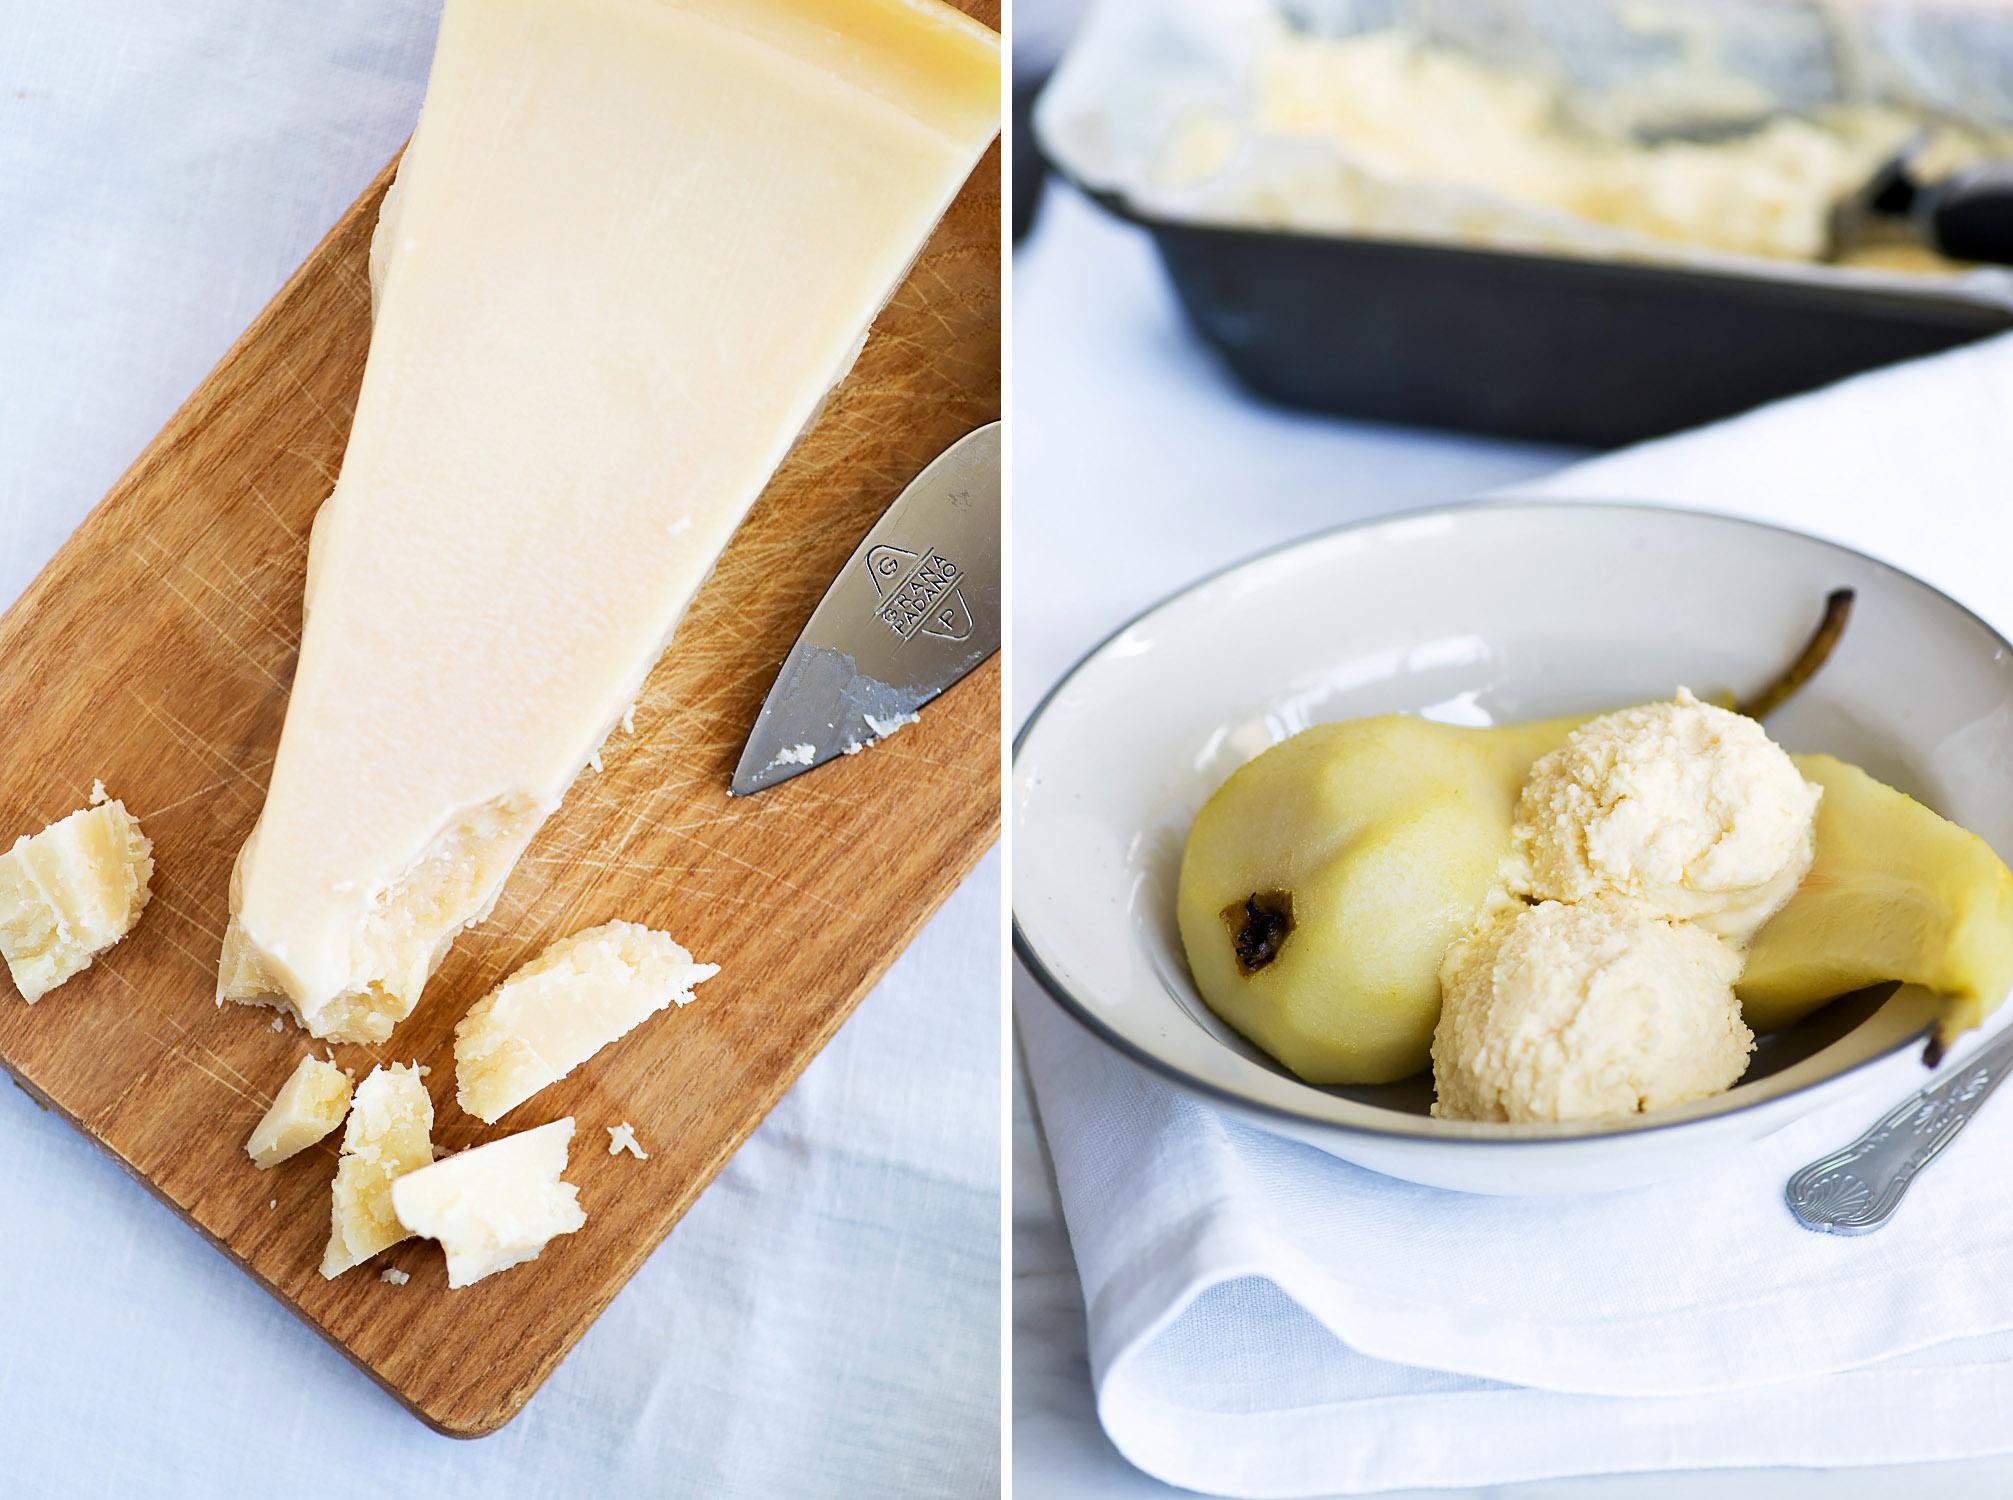 Poached Pears with Grana Padano Cheese Ice Cream